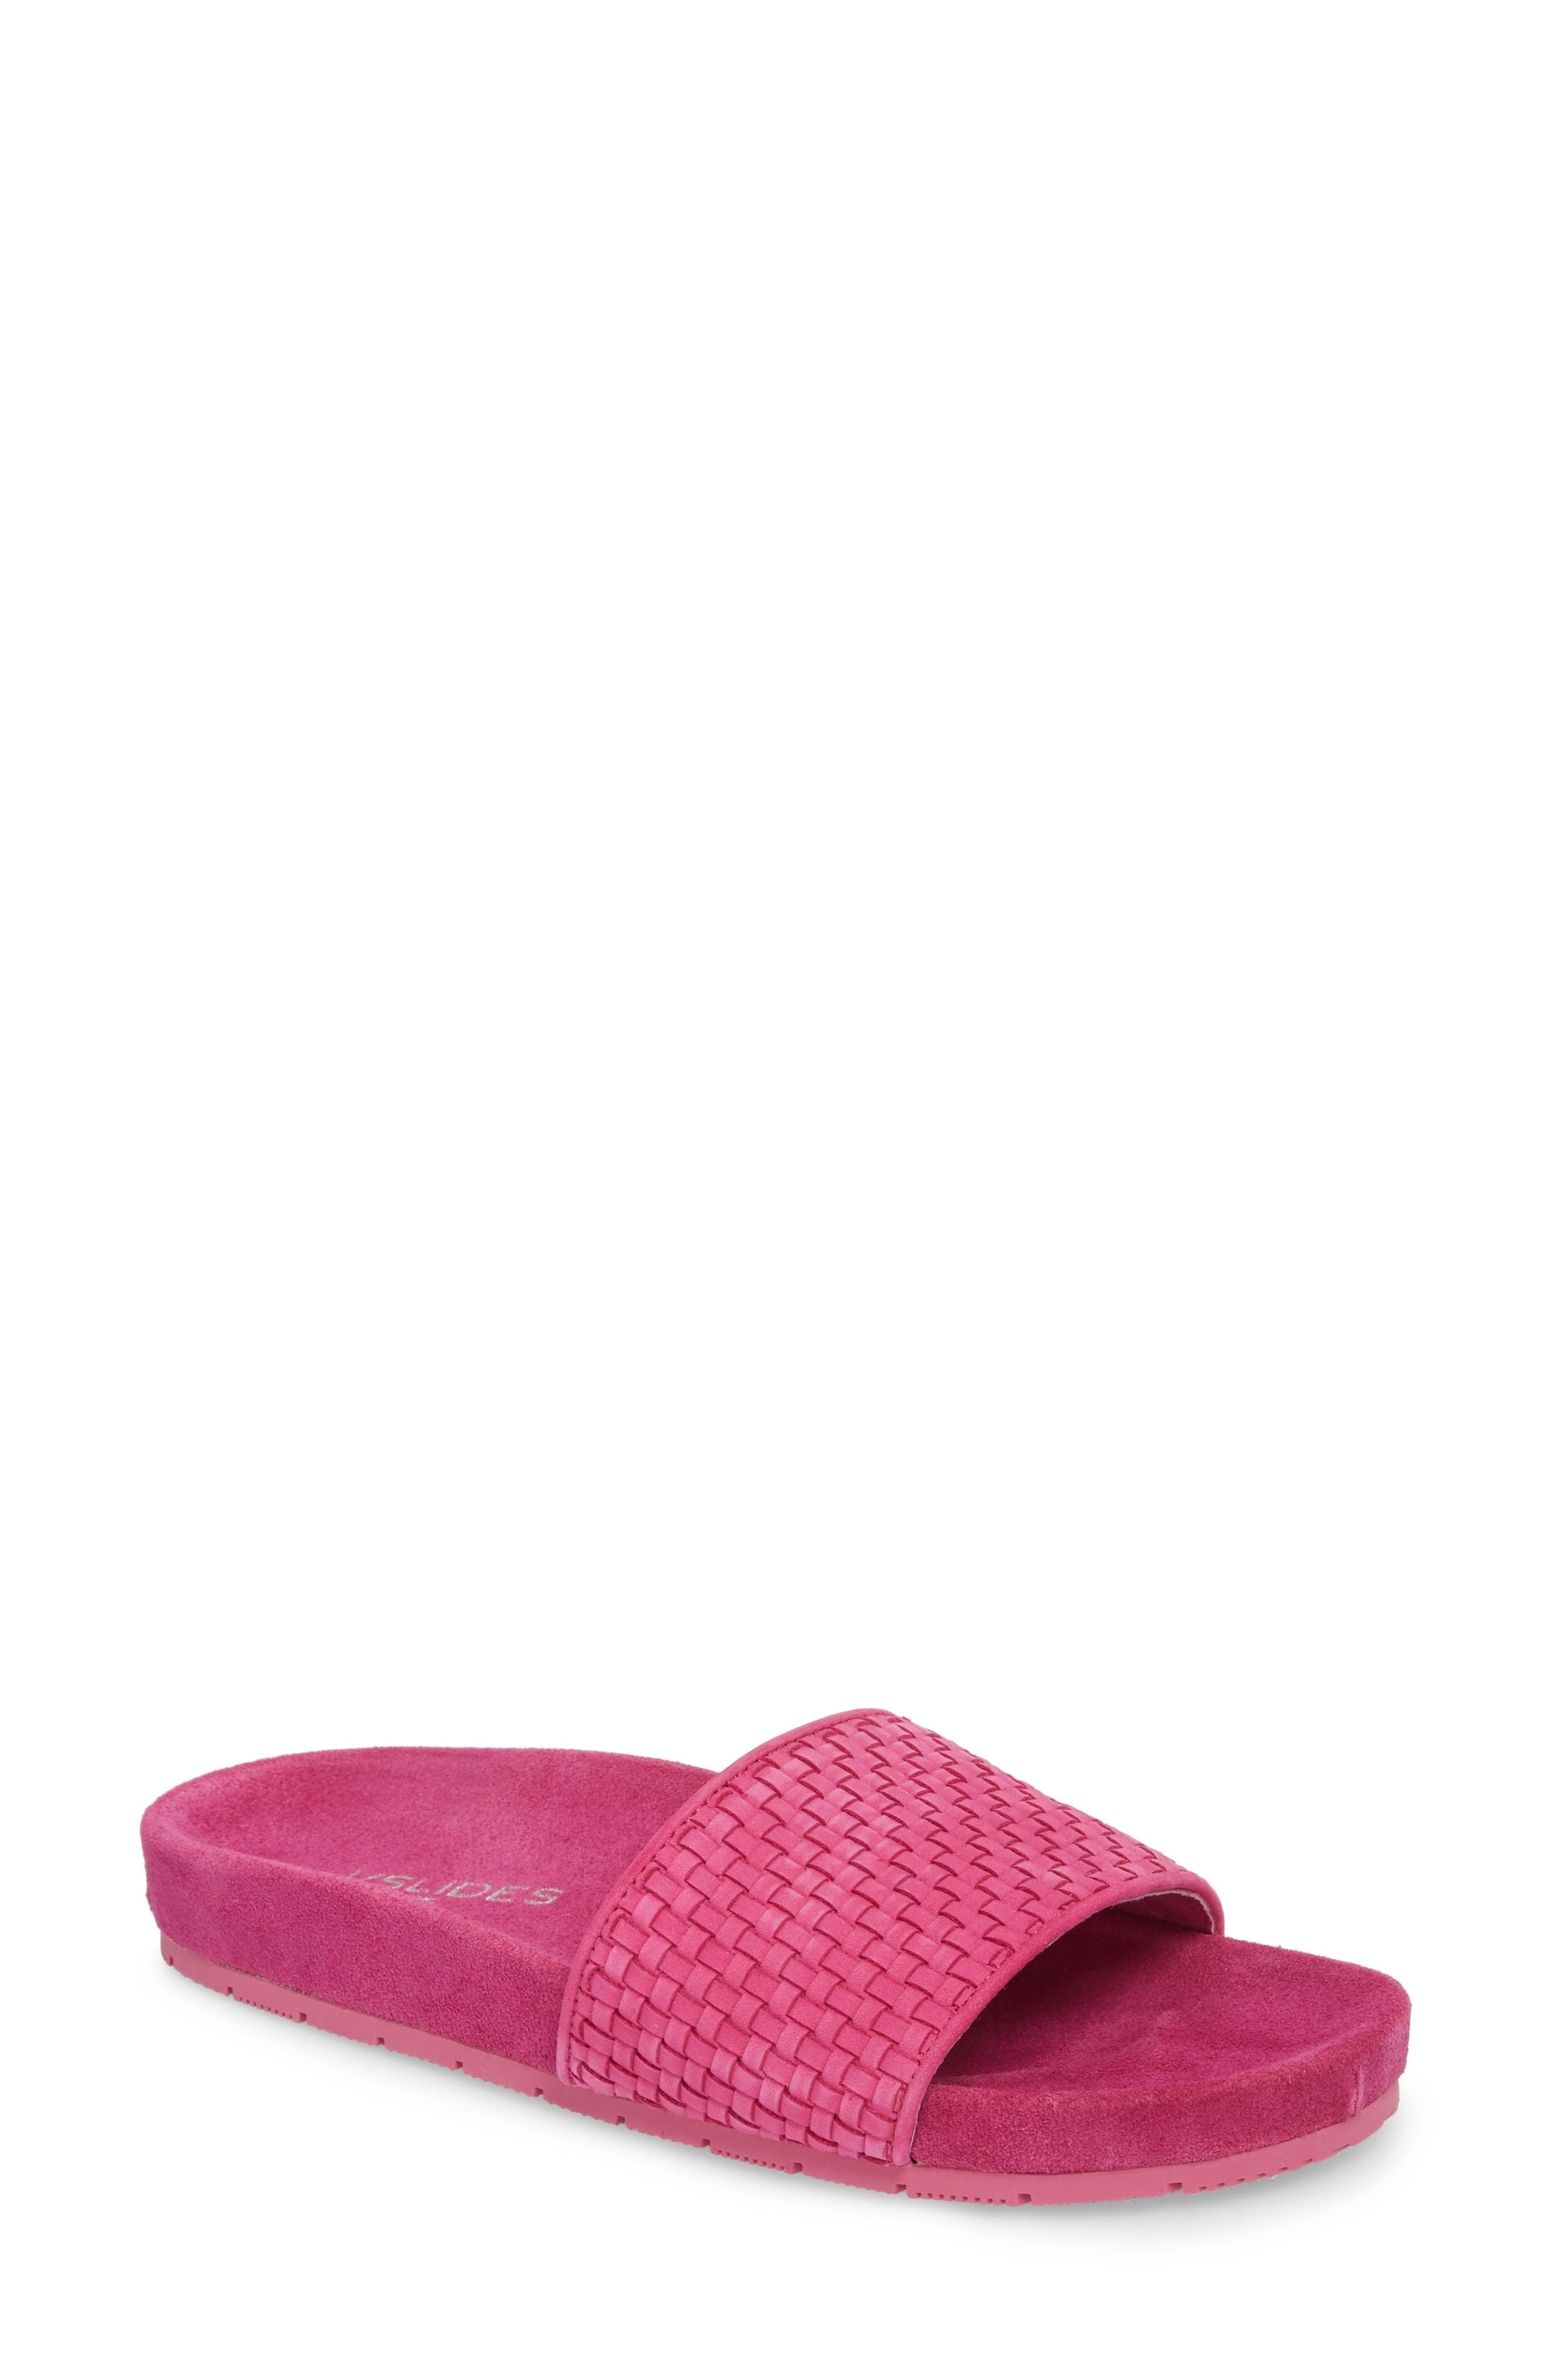 Naomie Slide Sandal,                             Main thumbnail 1, color,                             Magenta Suede